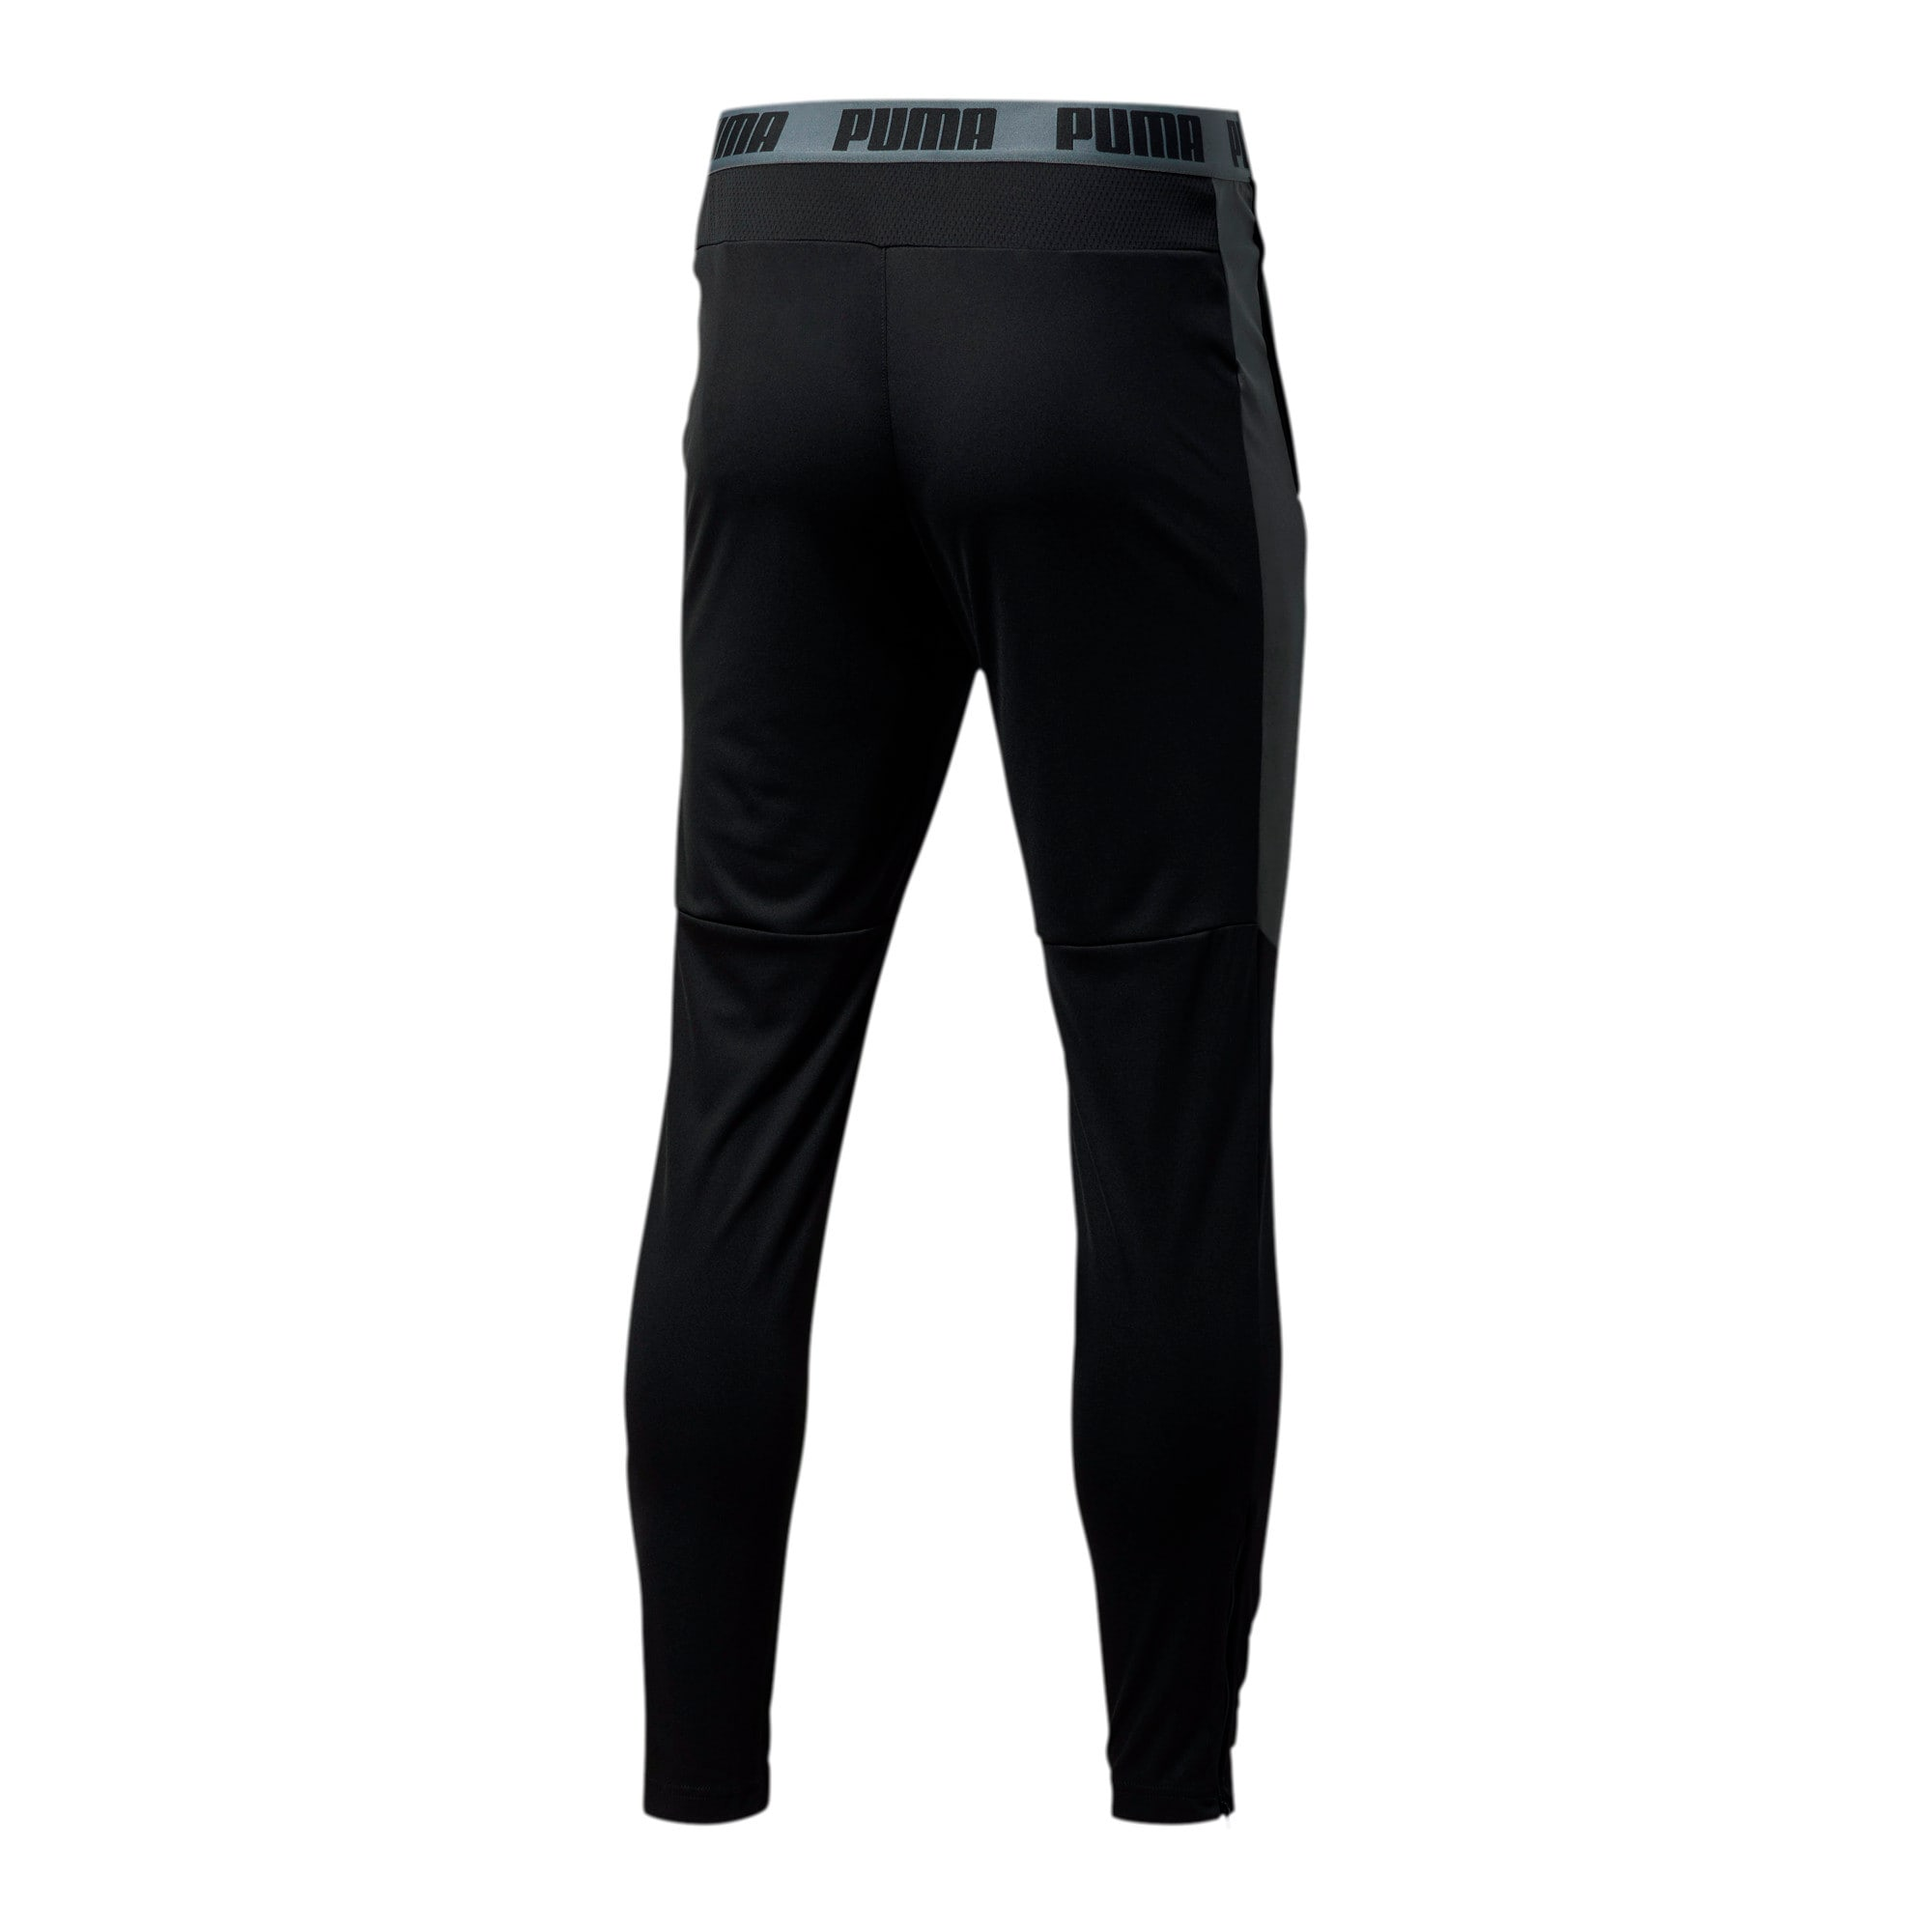 Thumbnail 5 of Men's Speed Pants, Puma Black-Asphalt, medium